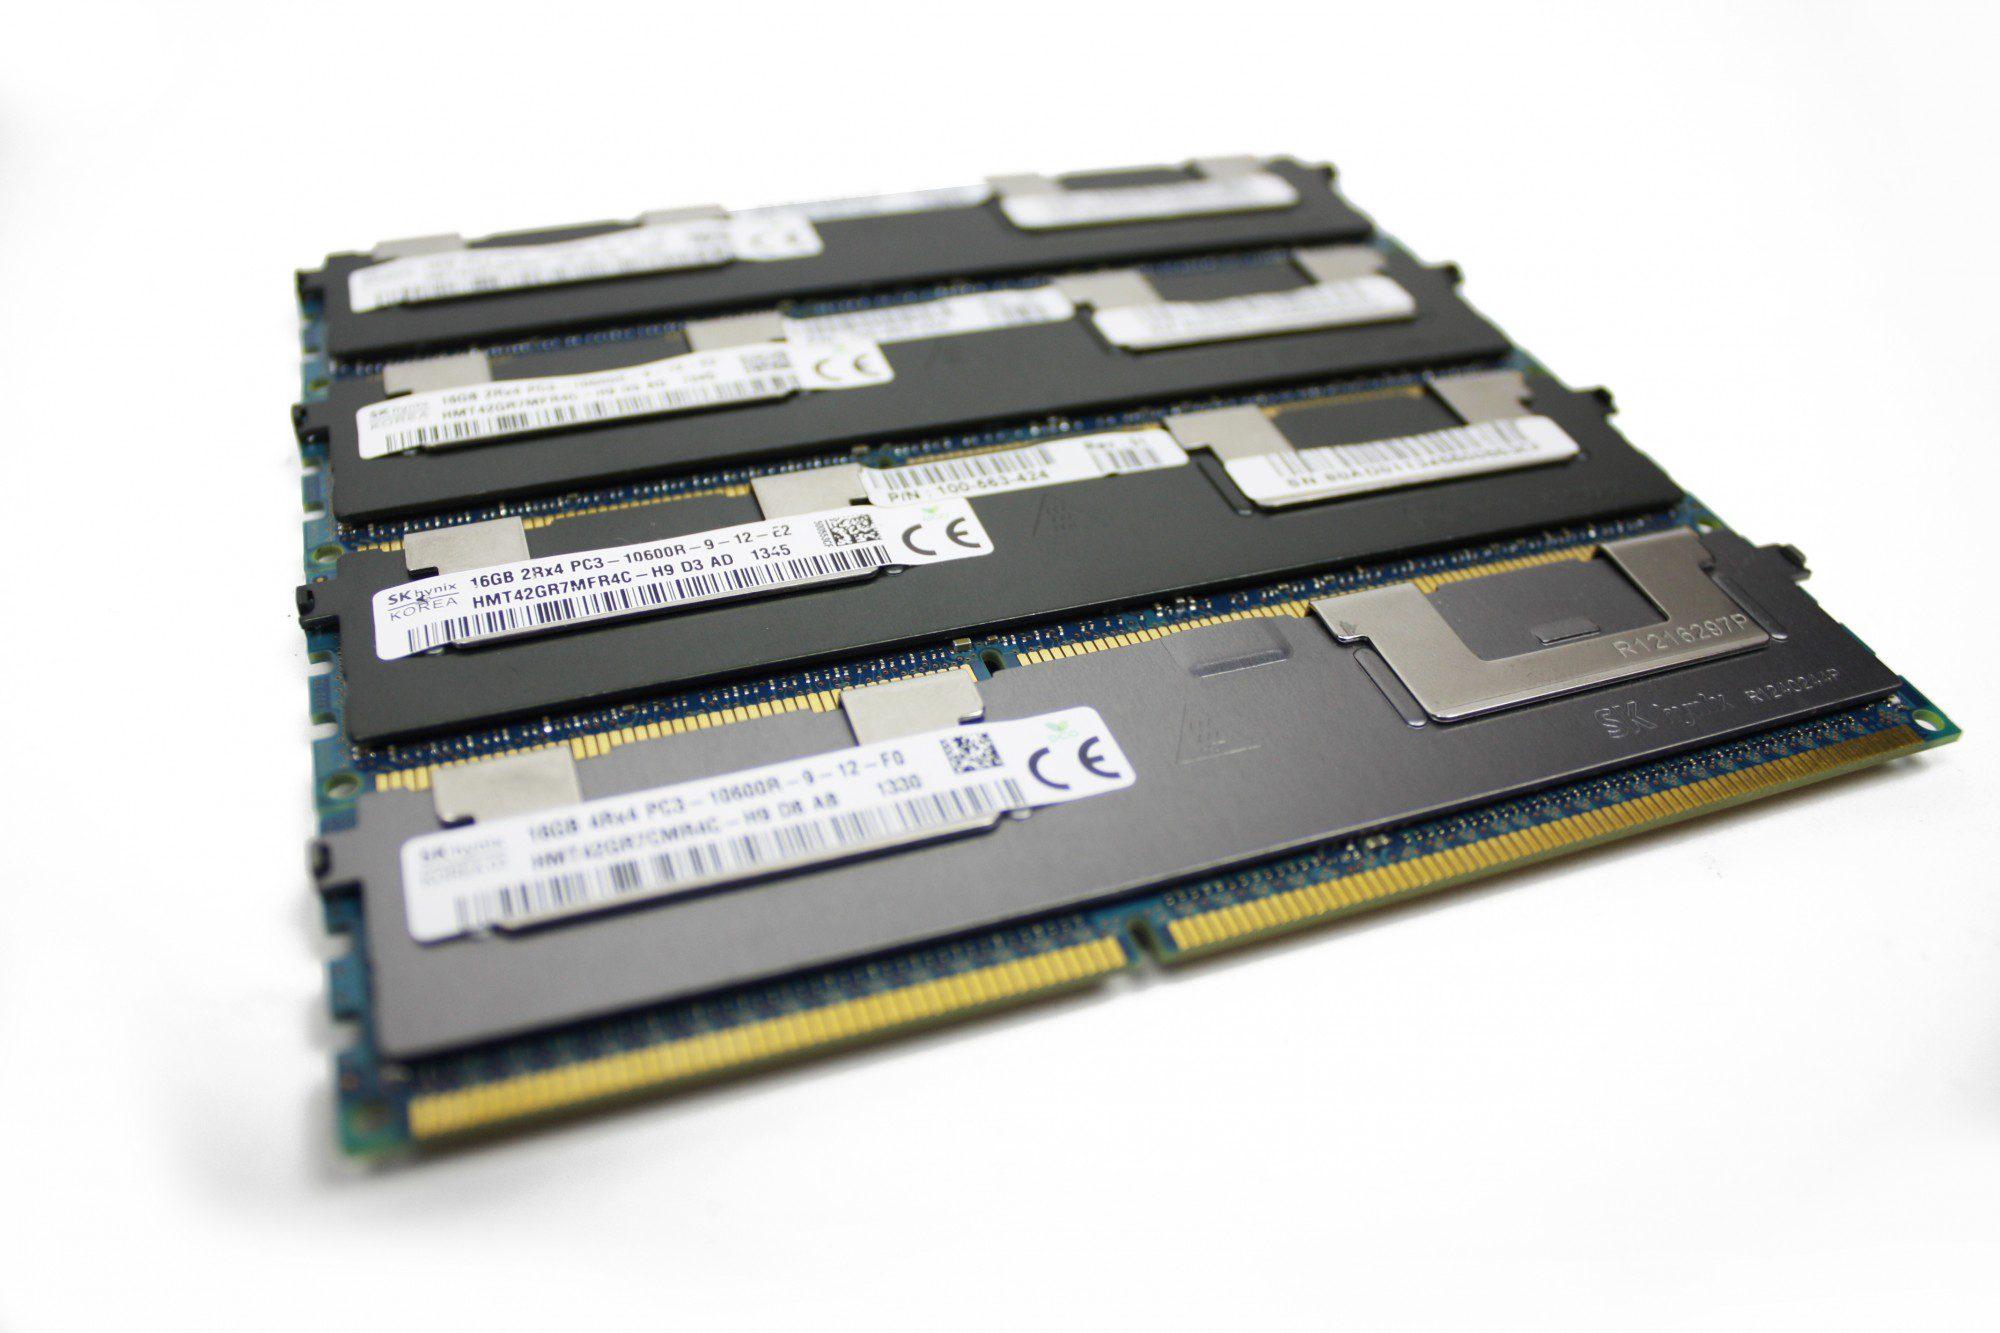 DDR3 RAM sticks